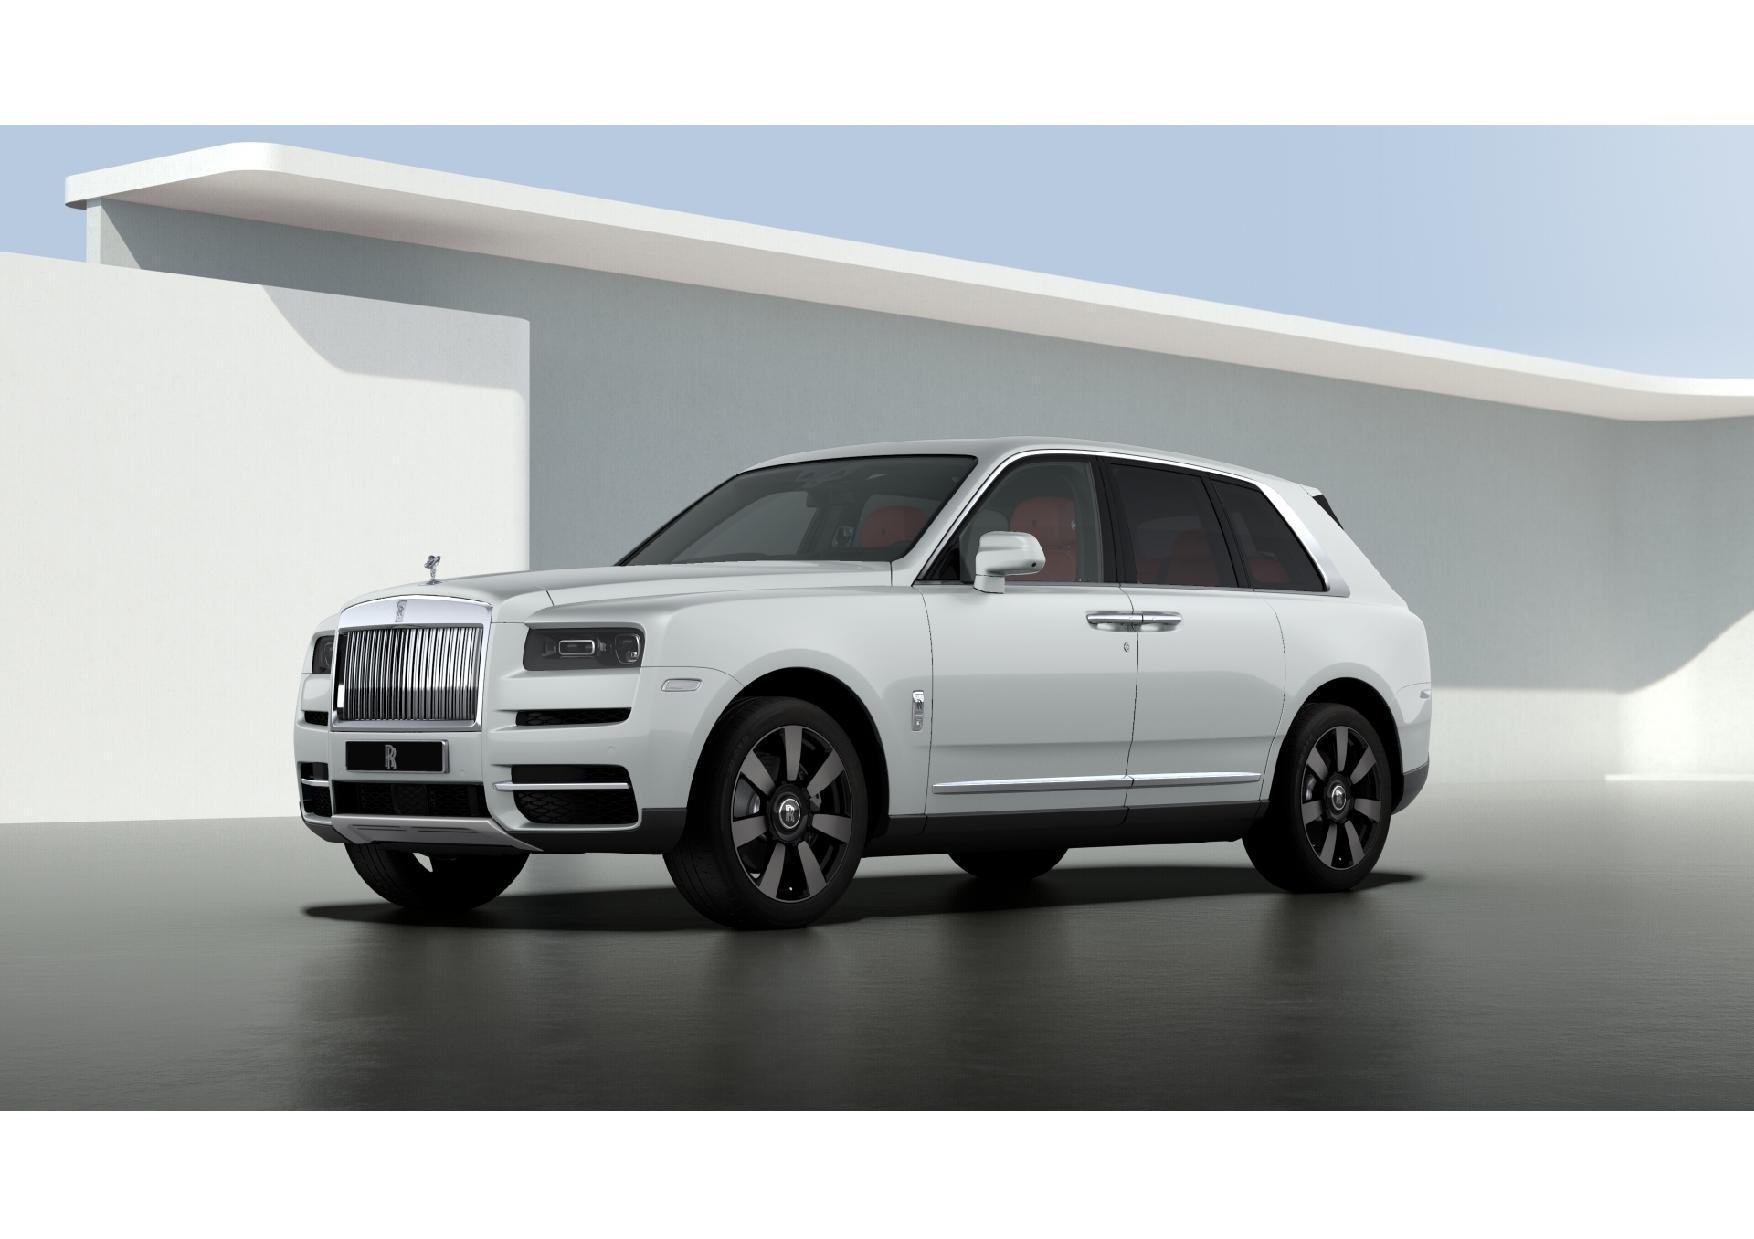 New 2021 Rolls-Royce Cullinan for sale $391,375 at Rolls-Royce Motor Cars Greenwich in Greenwich CT 06830 1